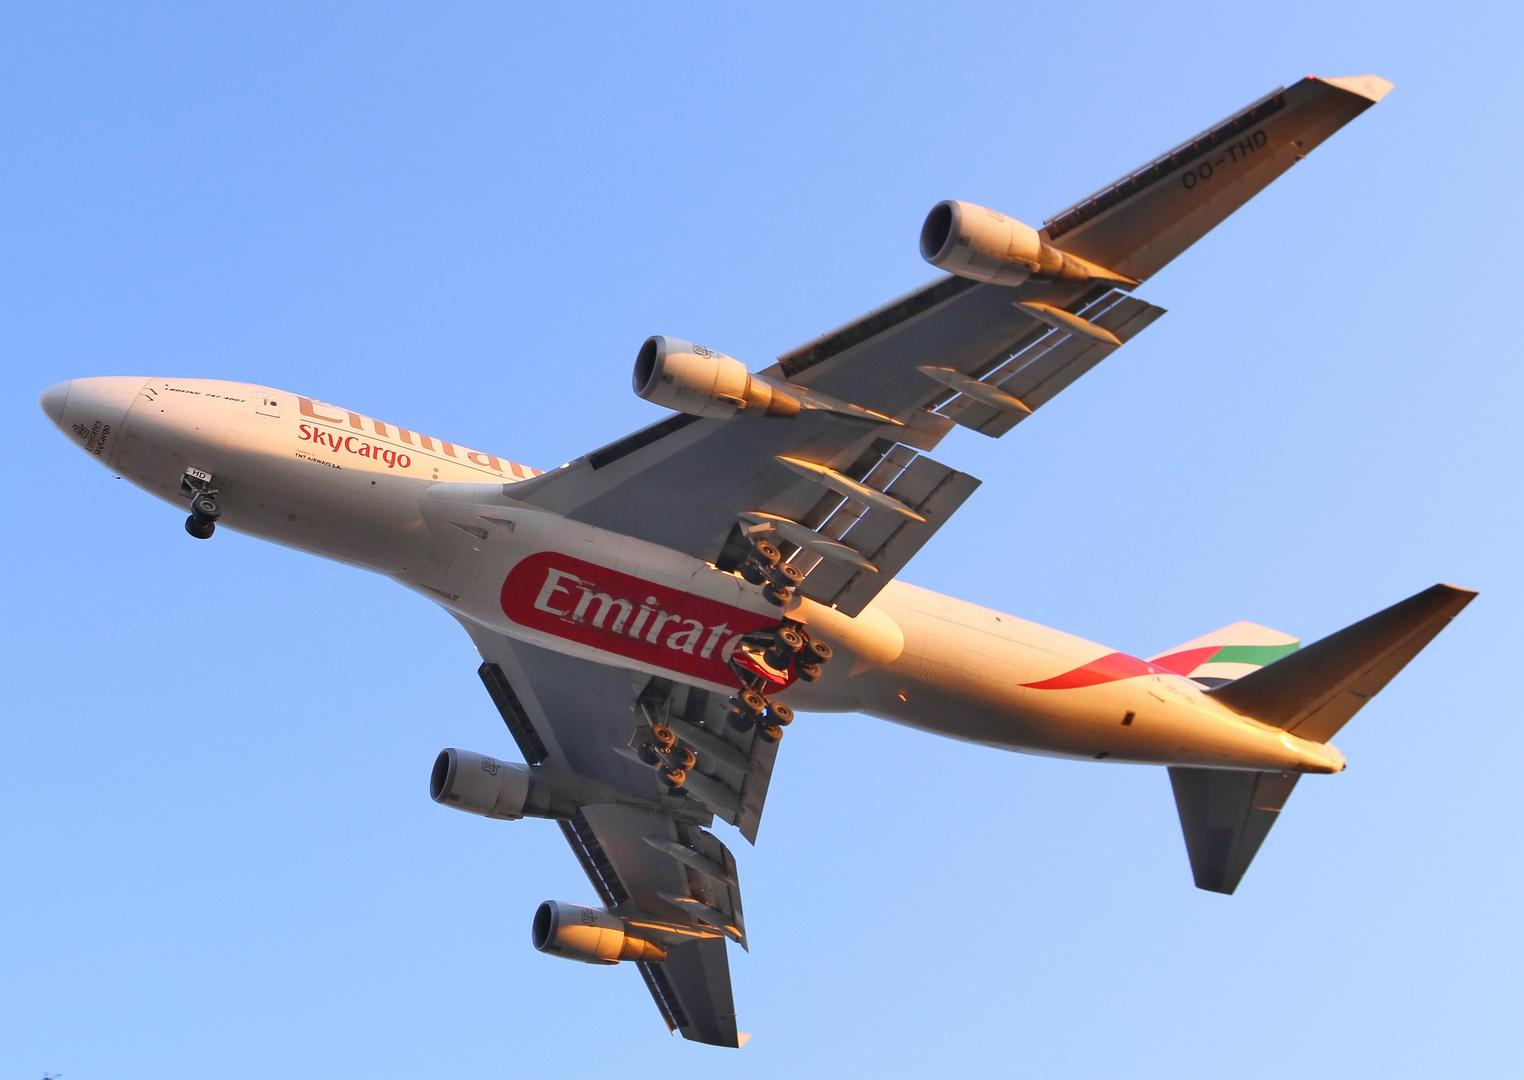 Emirates Sky Cargo 747-400 F